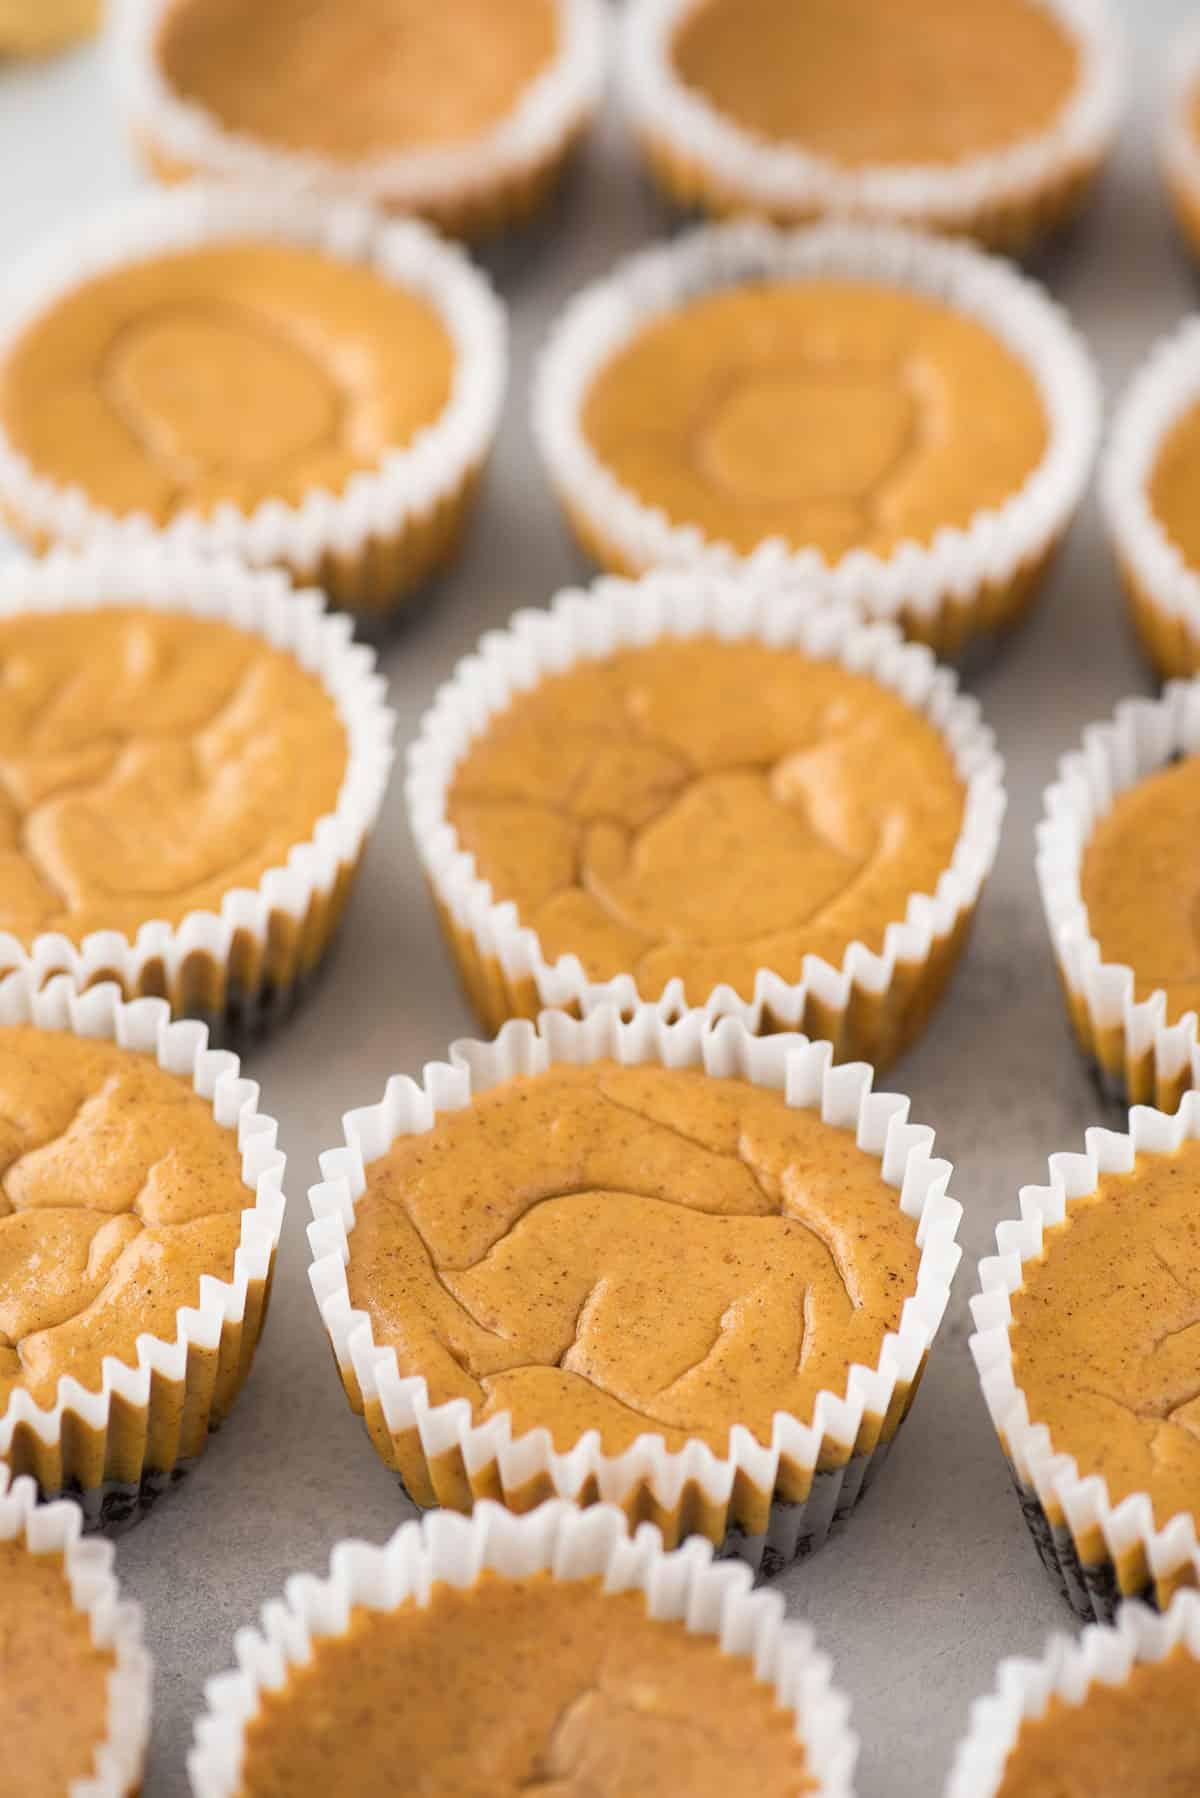 plain mini pumpkin cheesecakes in a row on gray background